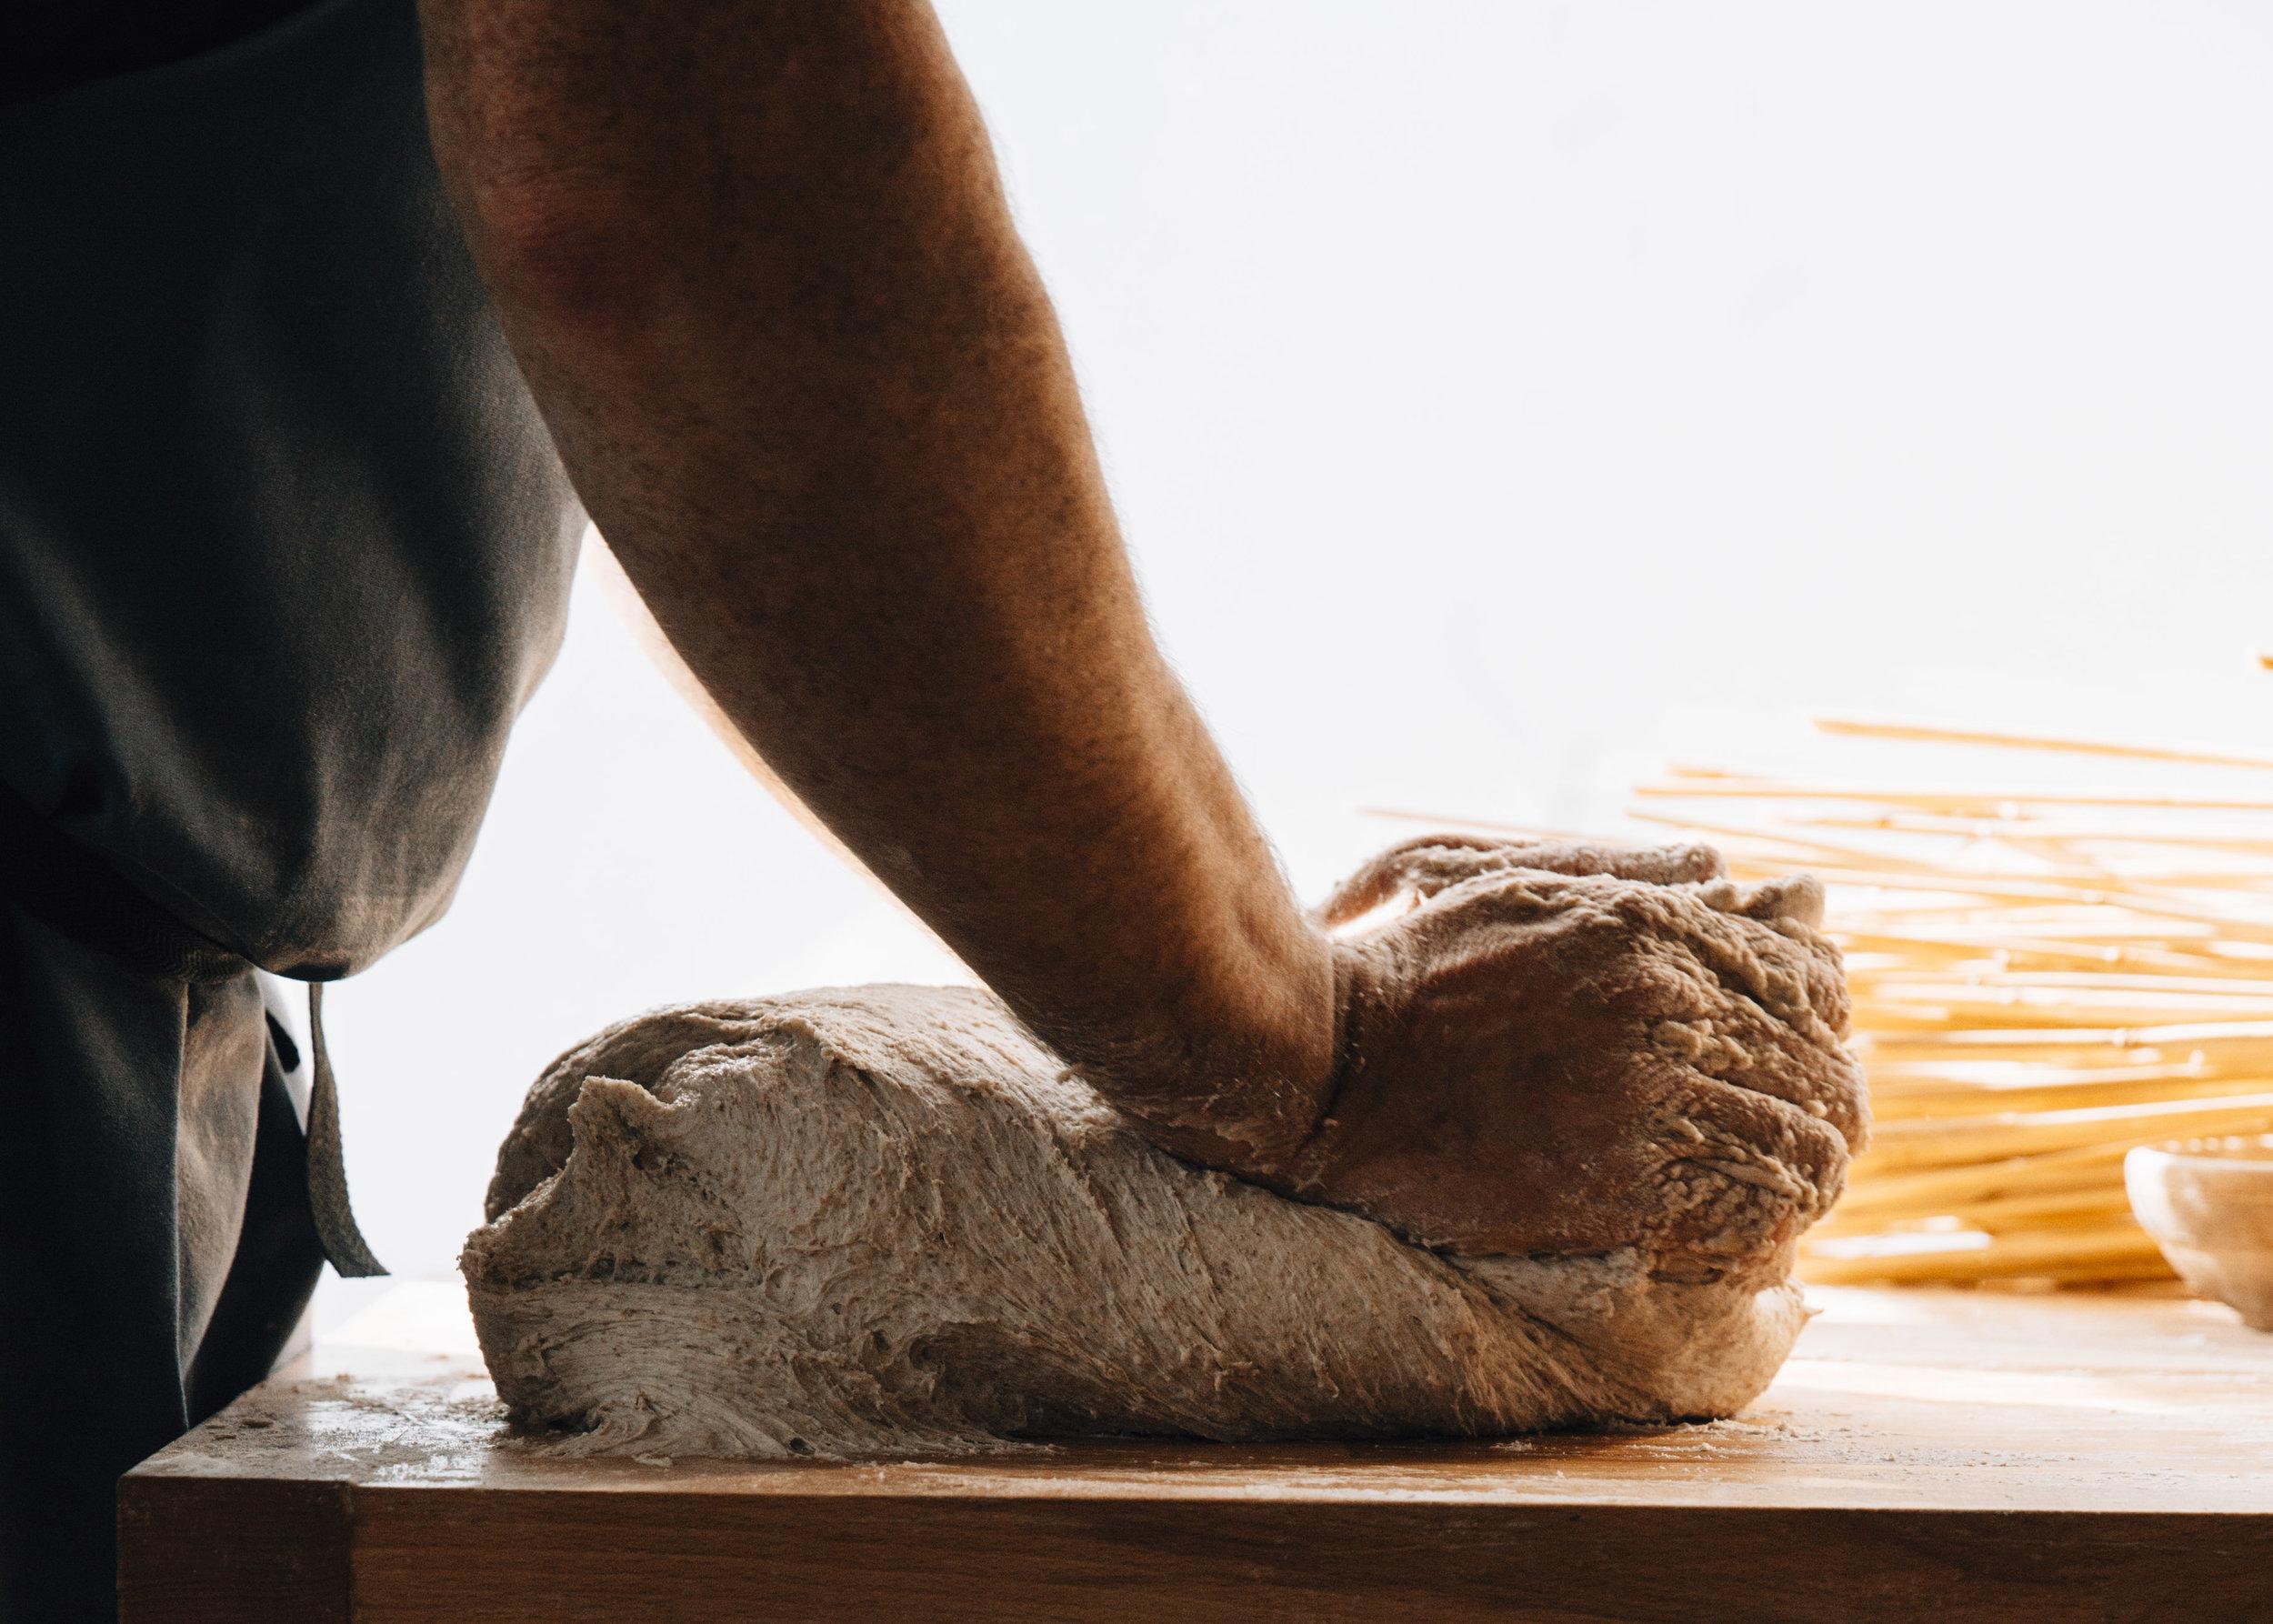 Irish bread making - Suech and Beck